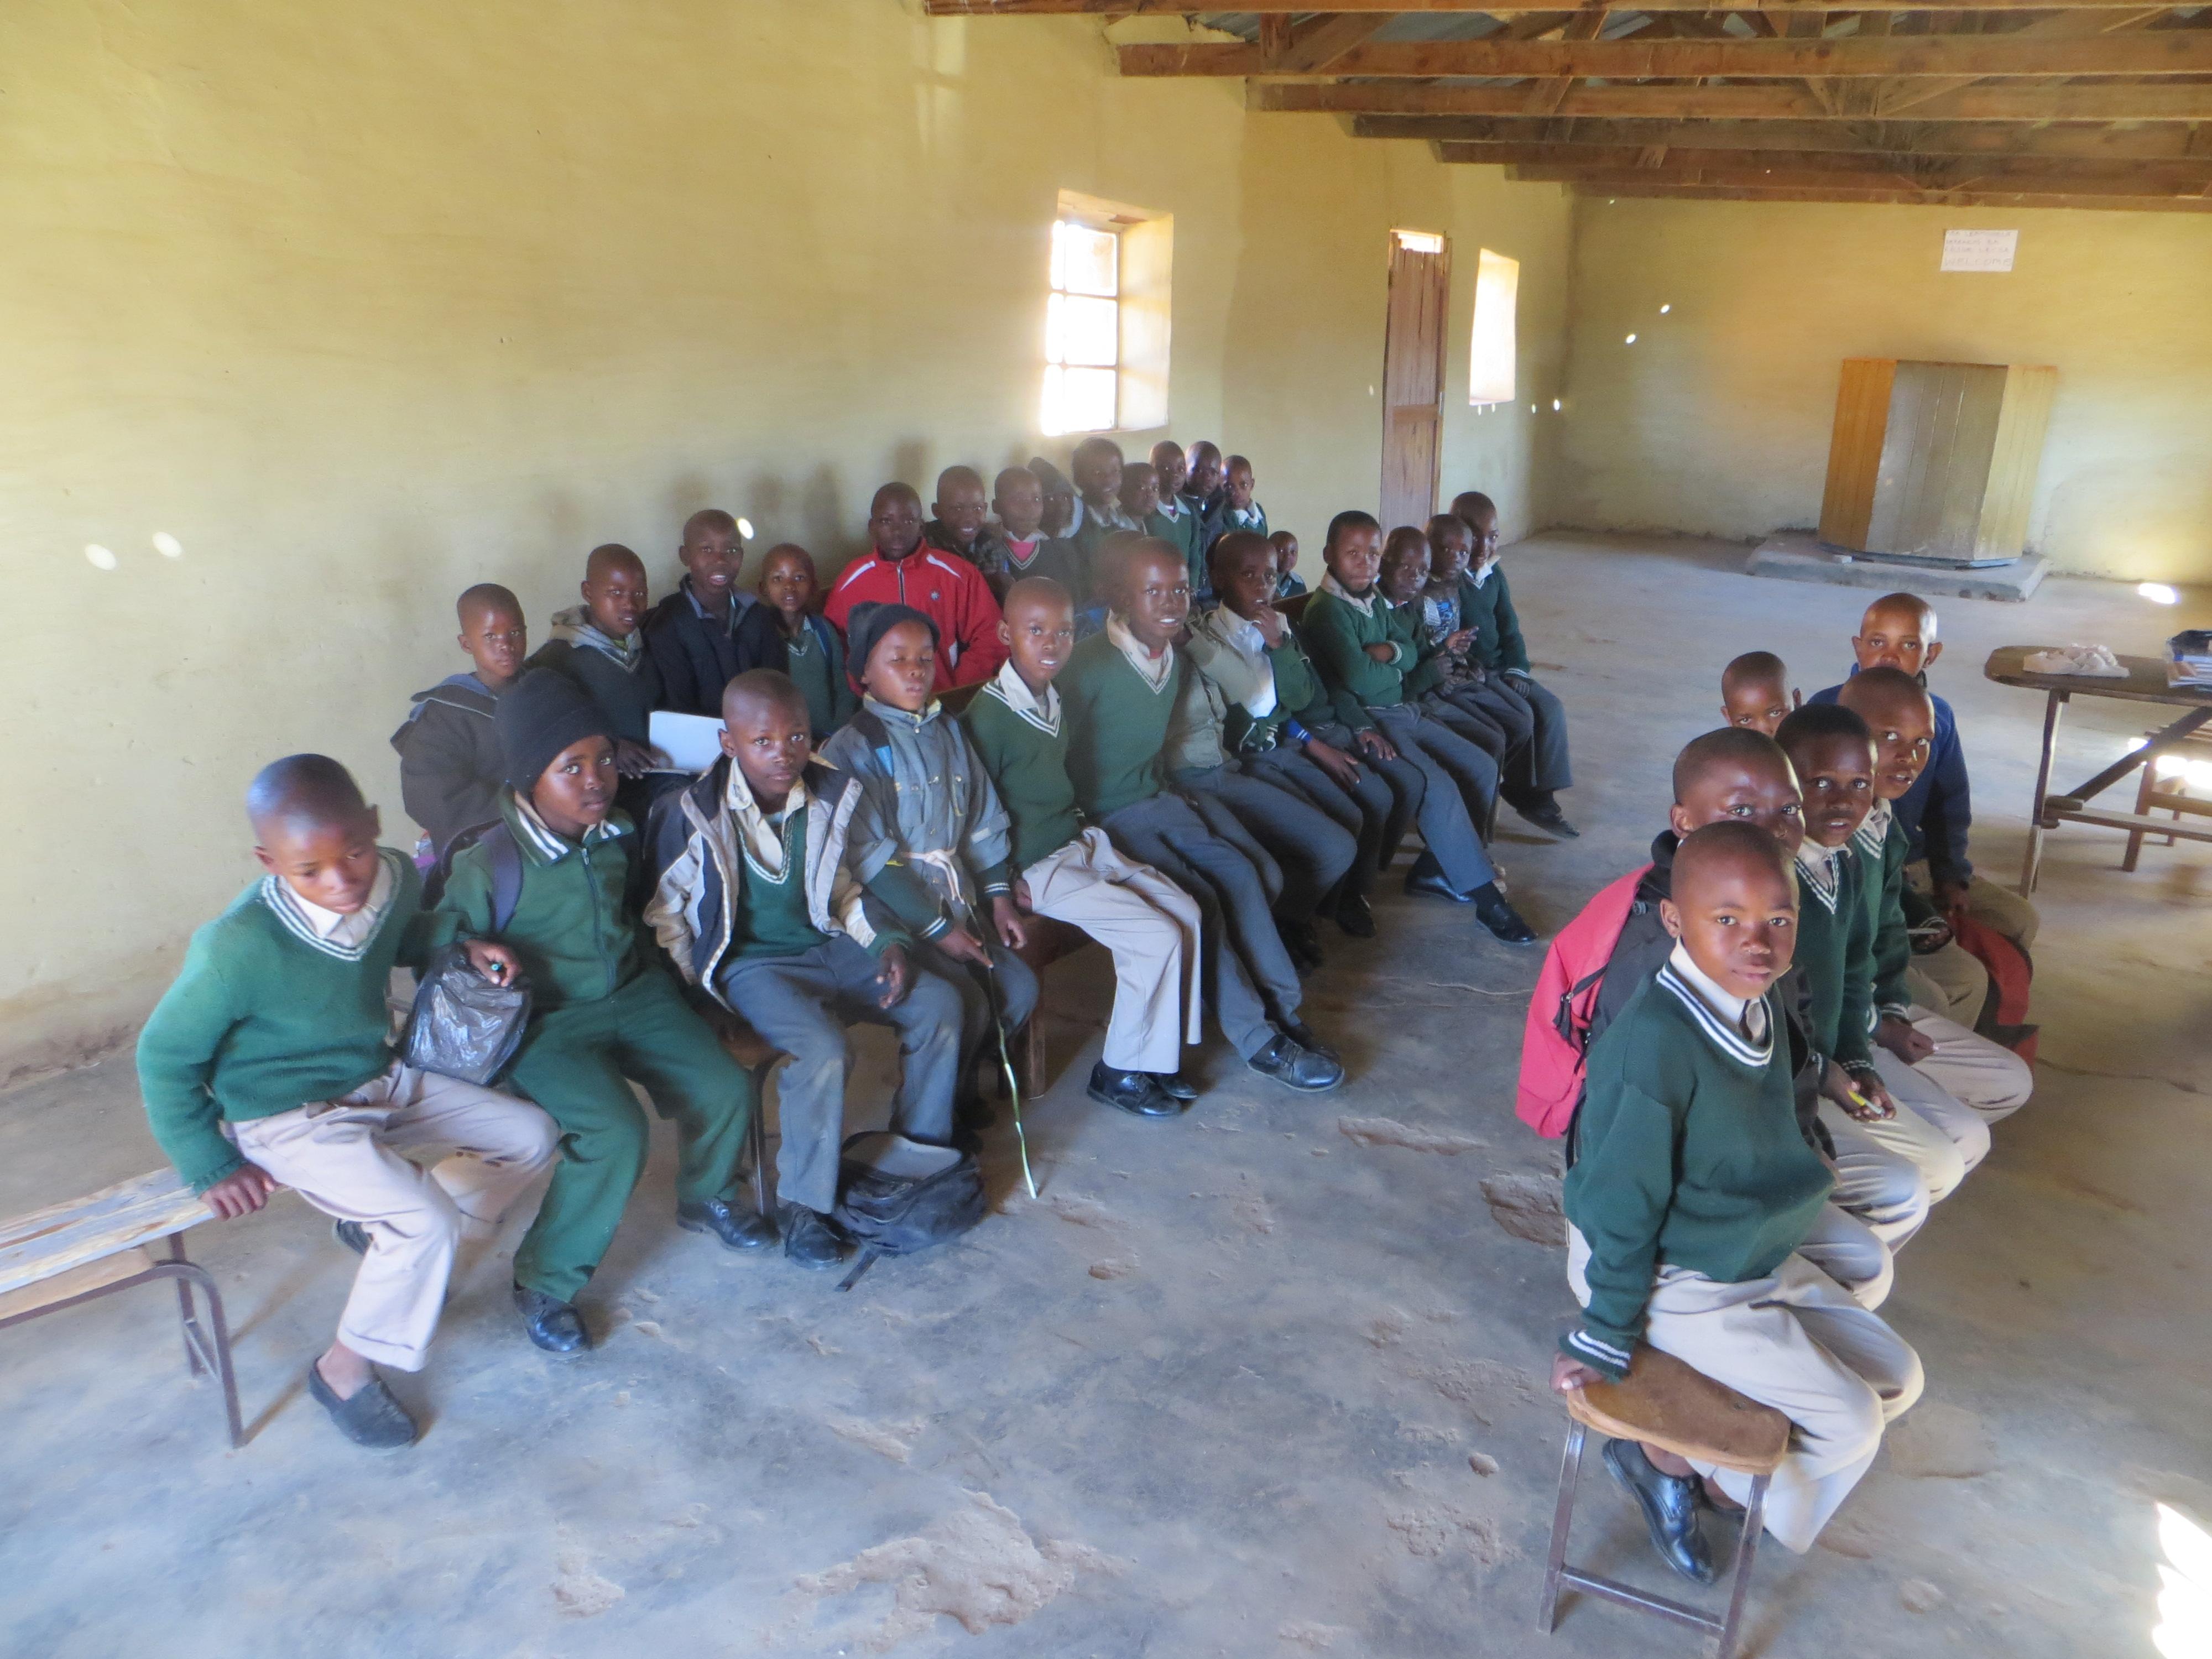 Lesotho_2016_Mark_Behle_no_desks.jpeg